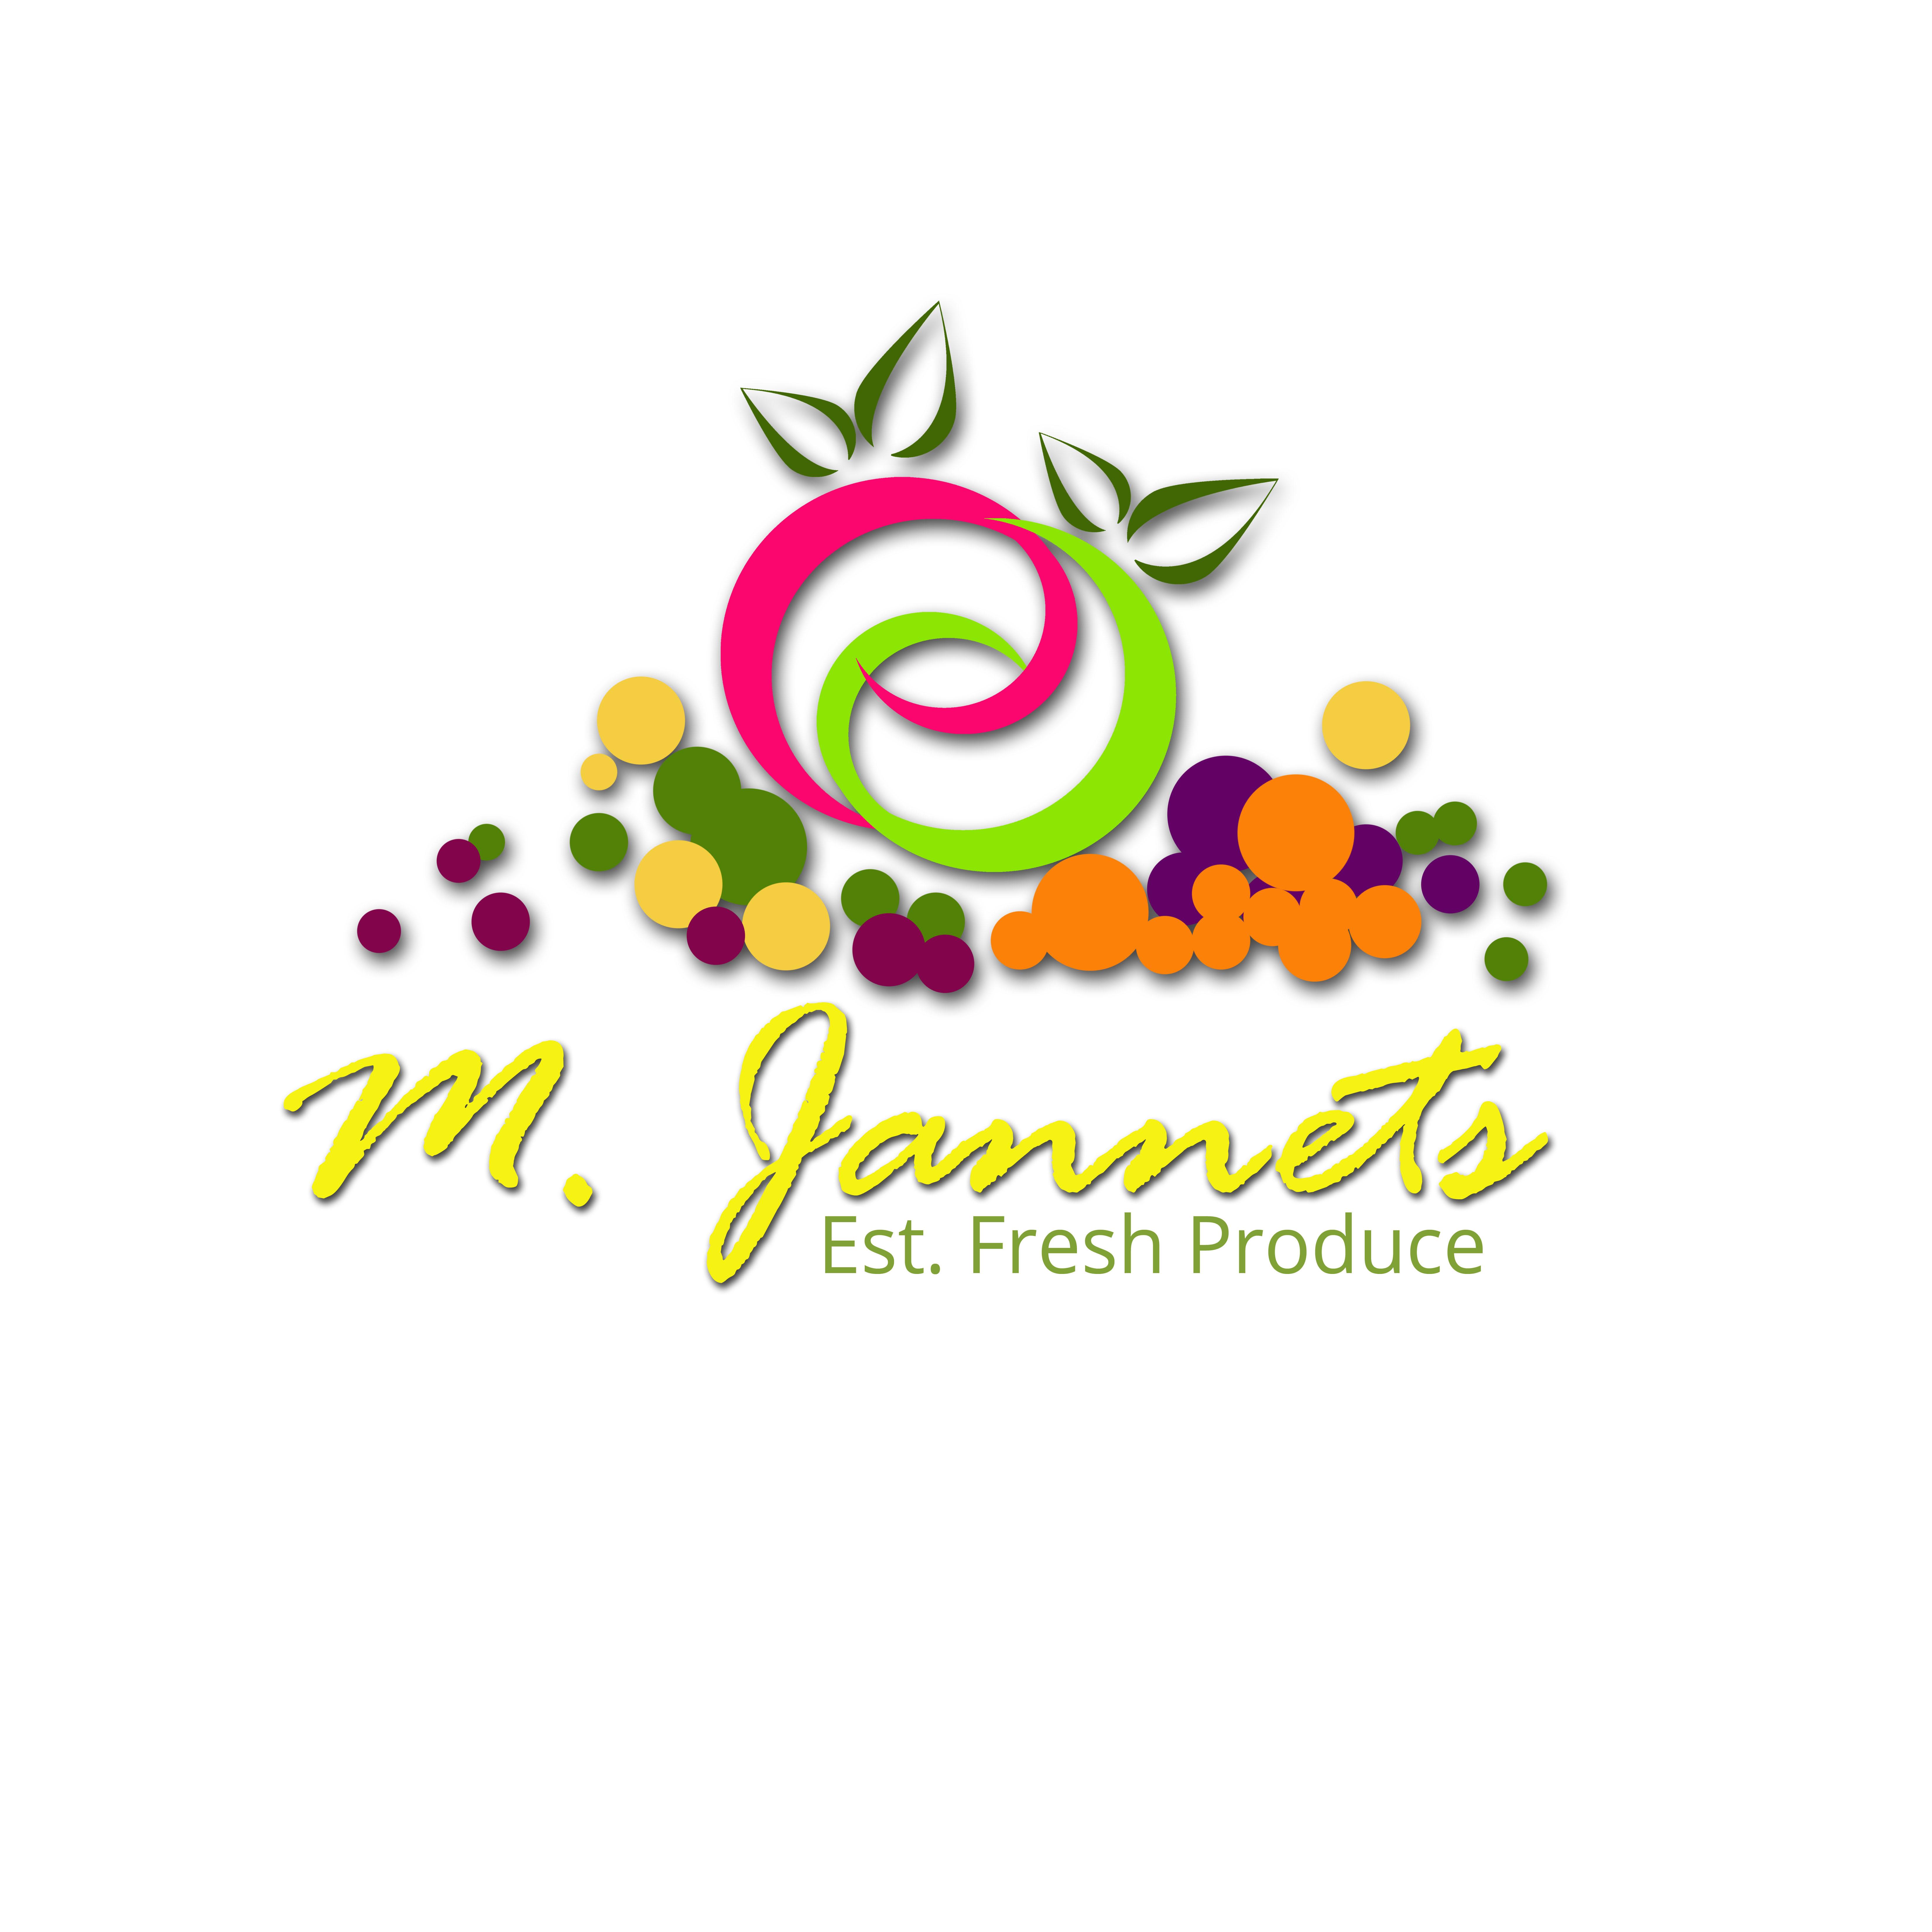 Logo Design by Allan Esclamado - Entry No. 24 in the Logo Design Contest Inspiring Logo Design for M. Jannets.